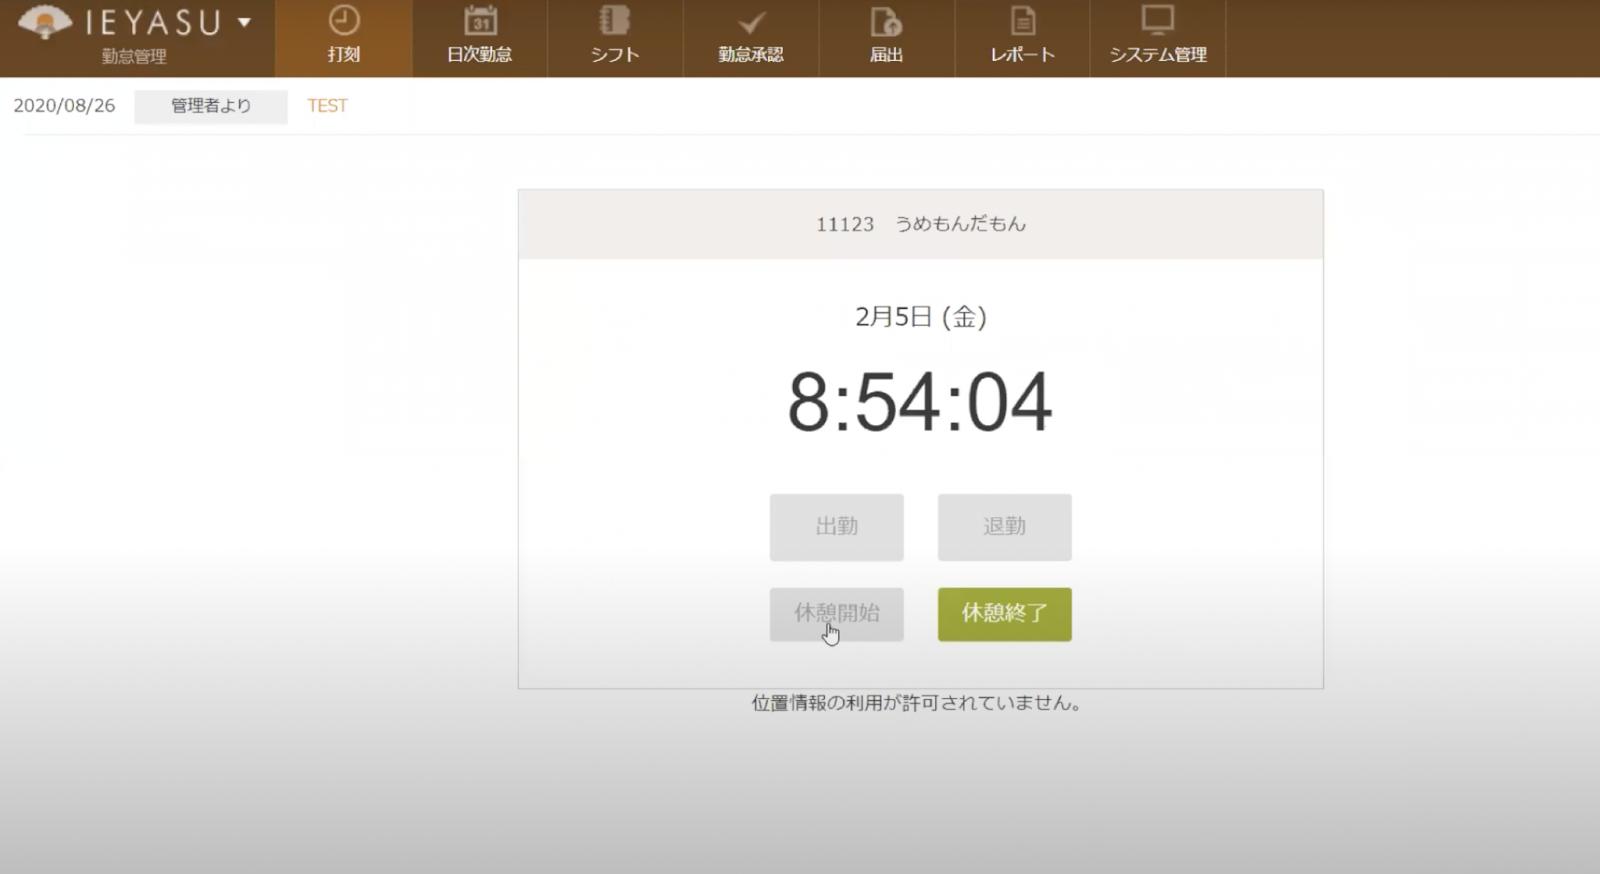 IEYASU打刻画面3